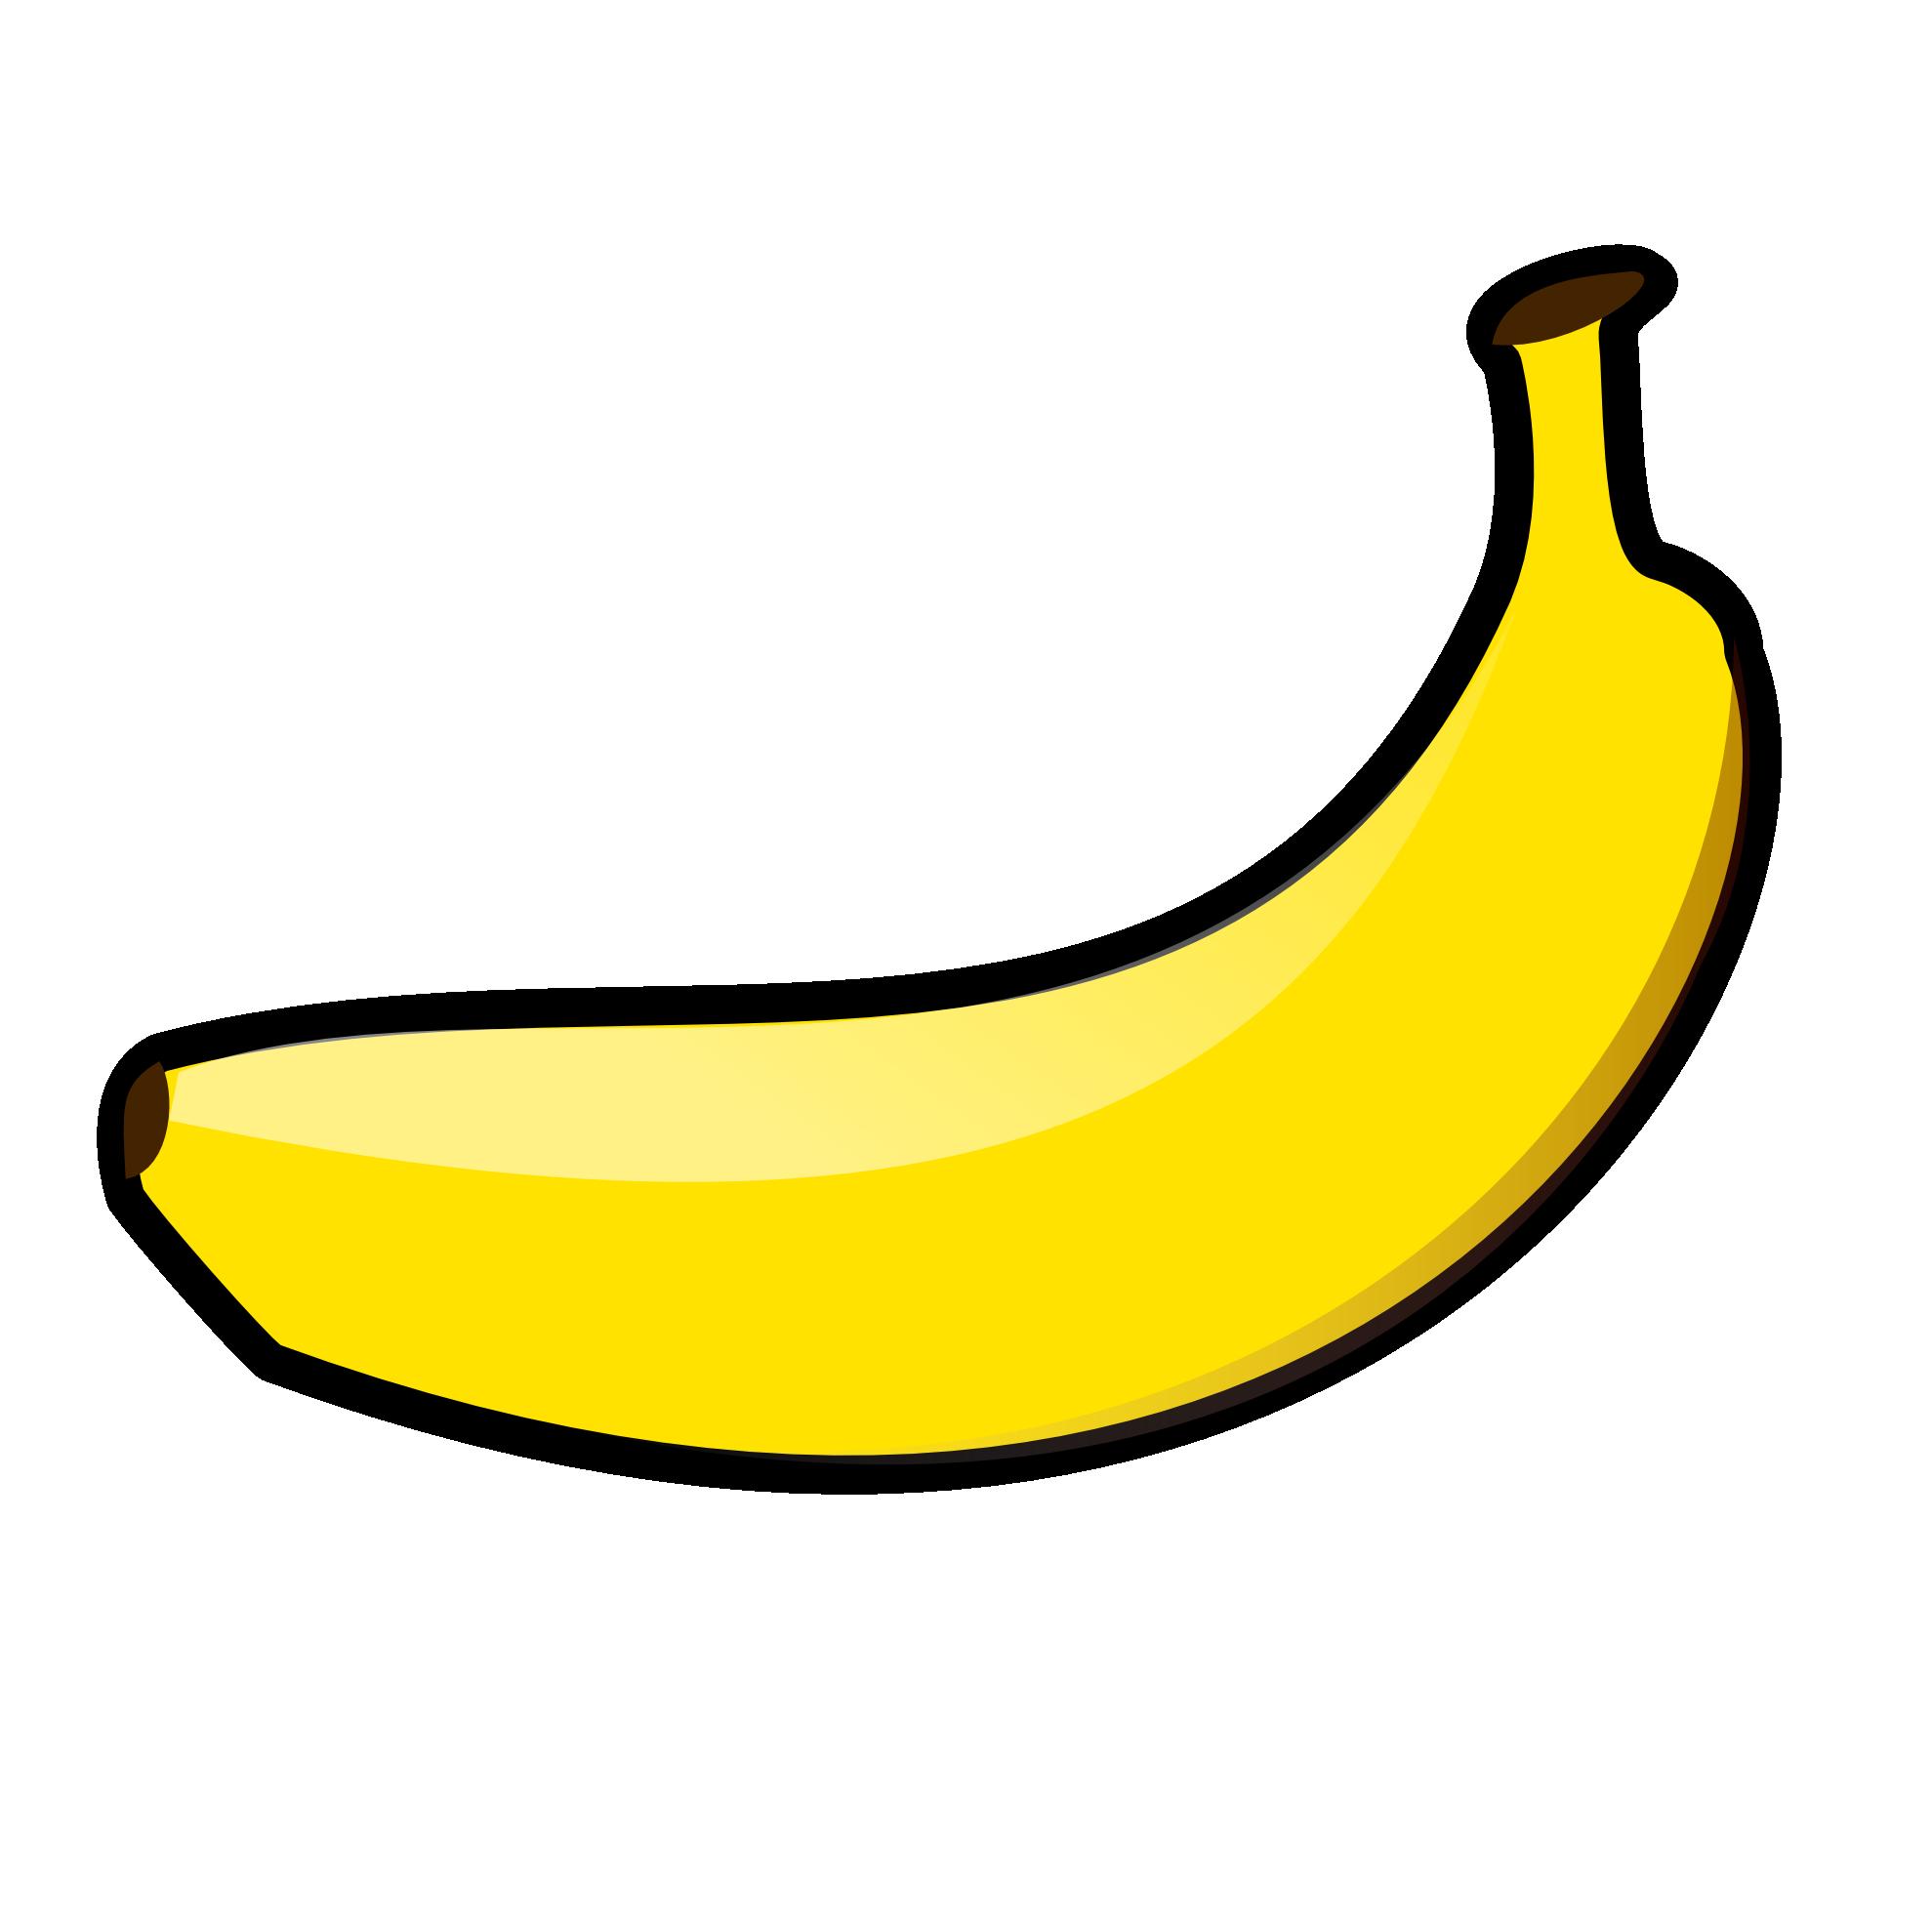 banana clipart black and education play